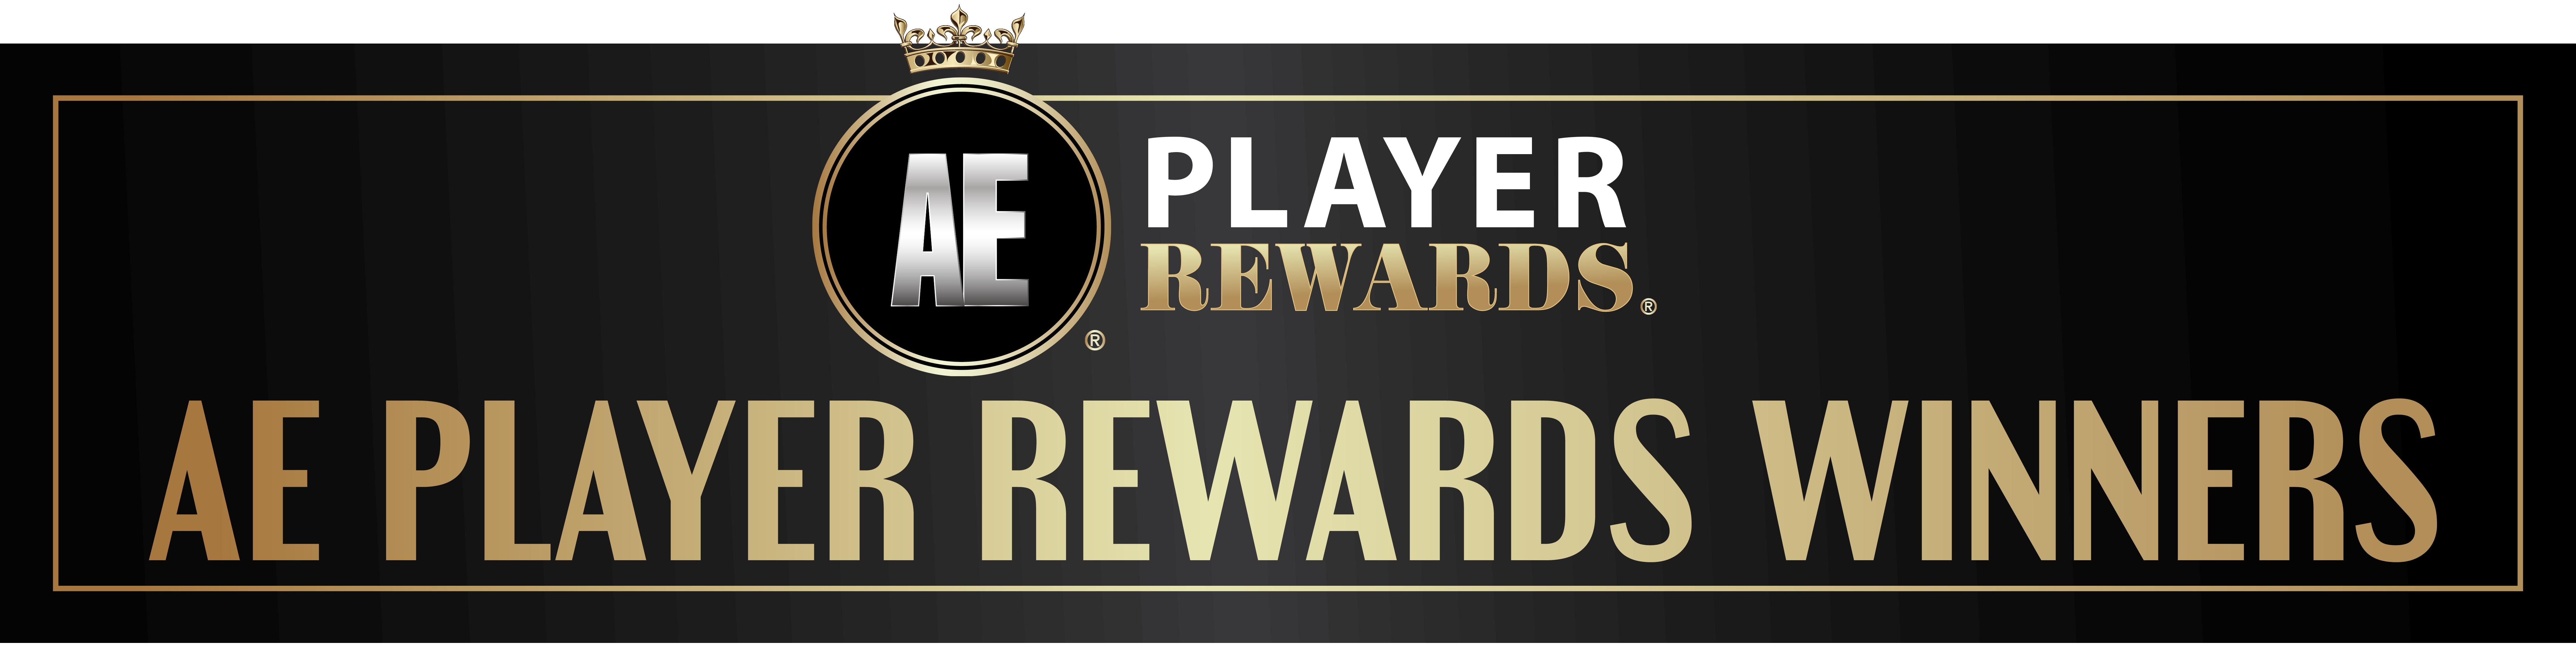 AE Player Rewards Winners